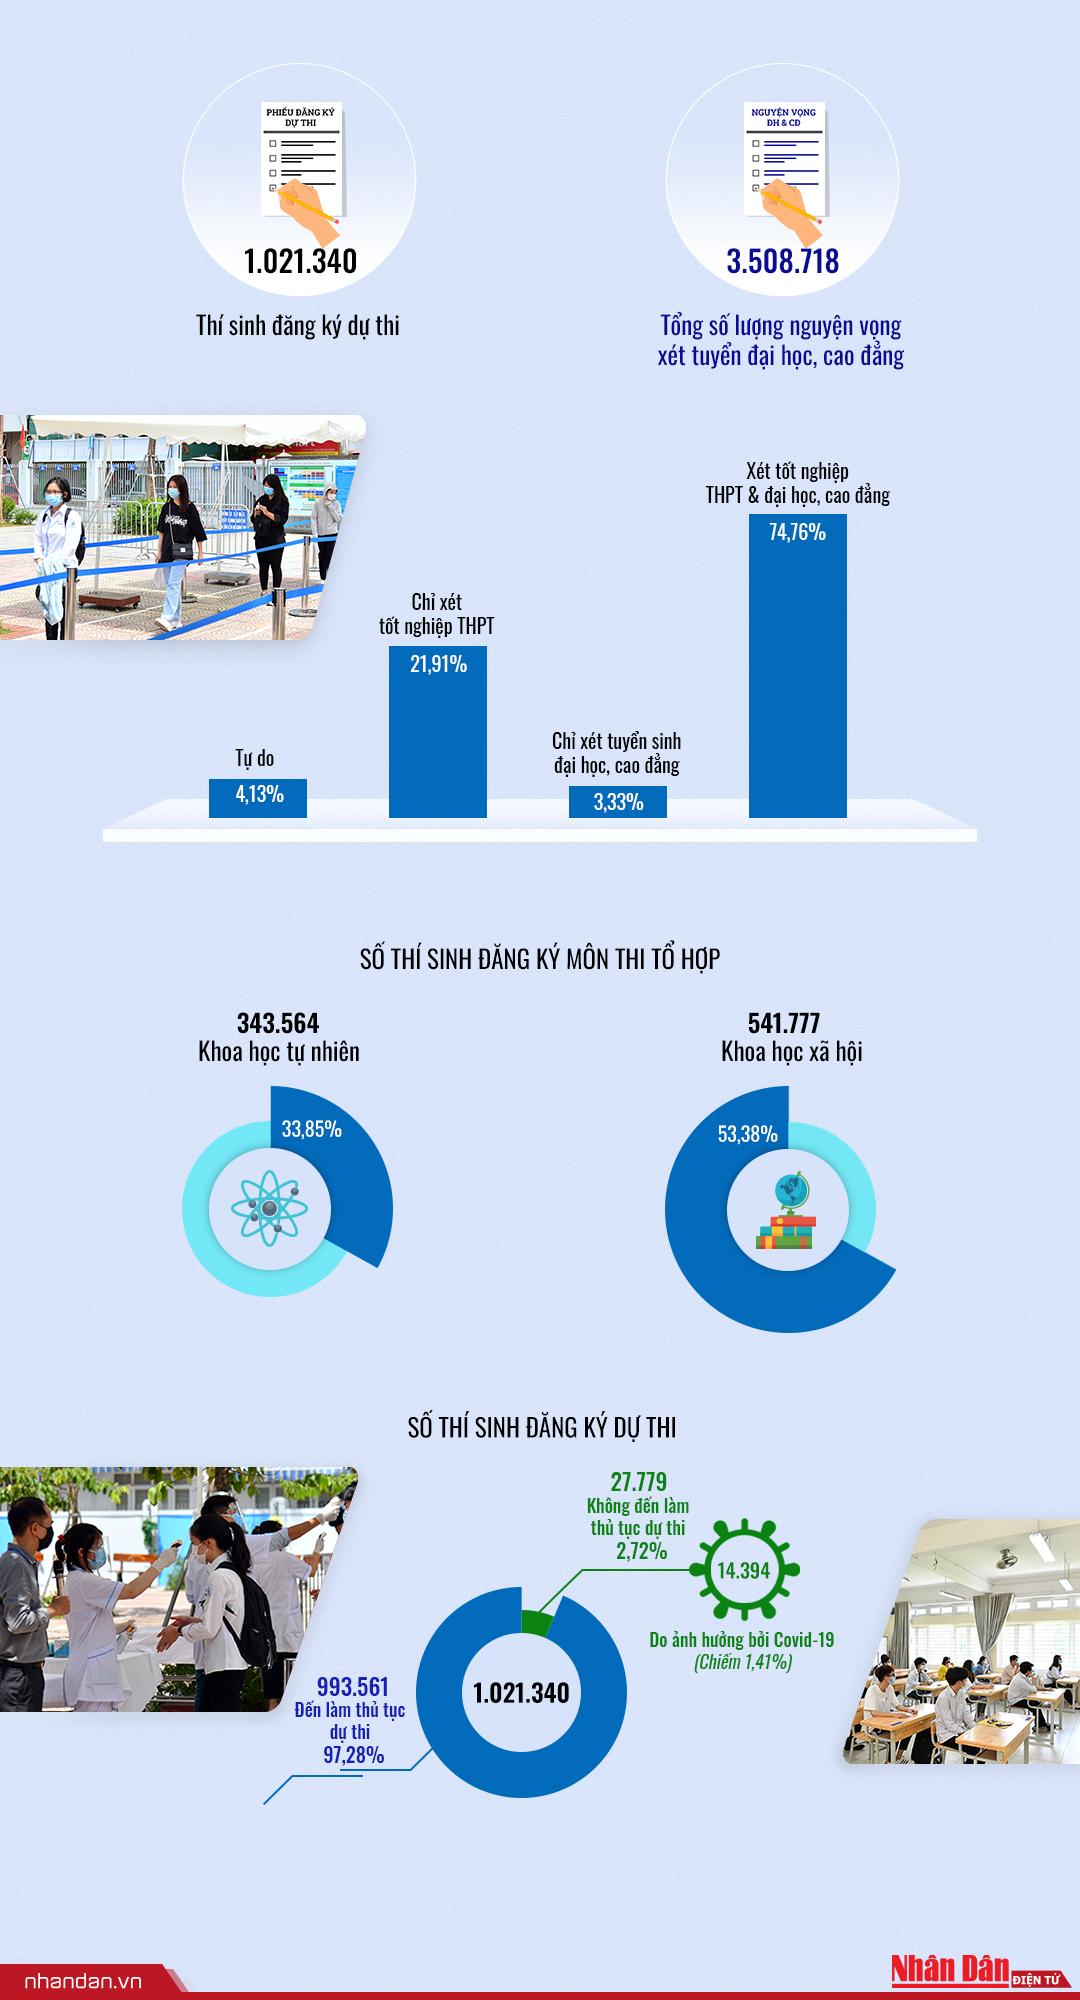 infographic-1tr thi sinh 2021.jpg -0